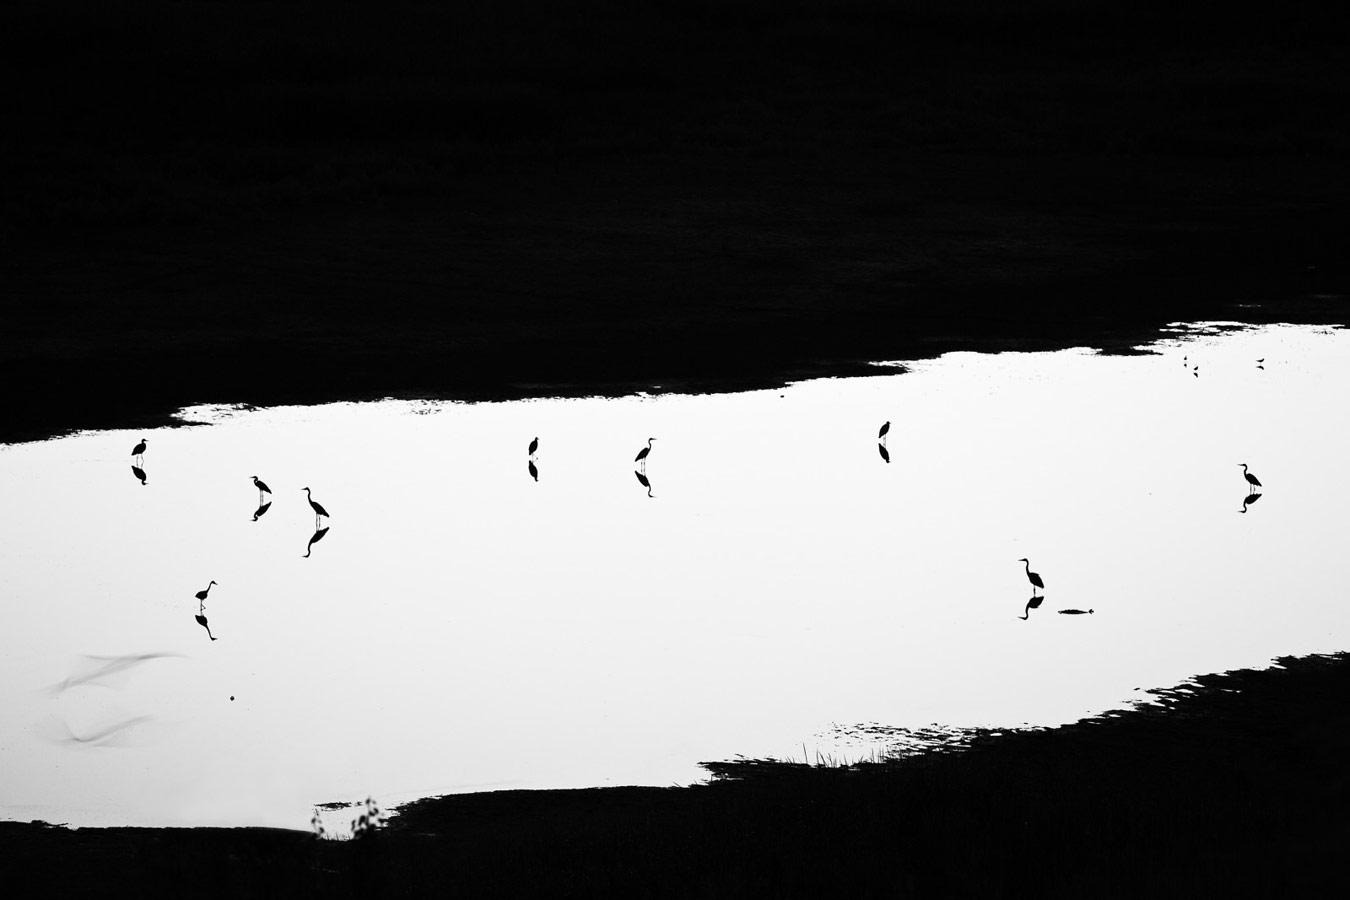 В сумерках, © Юрий Сорокин